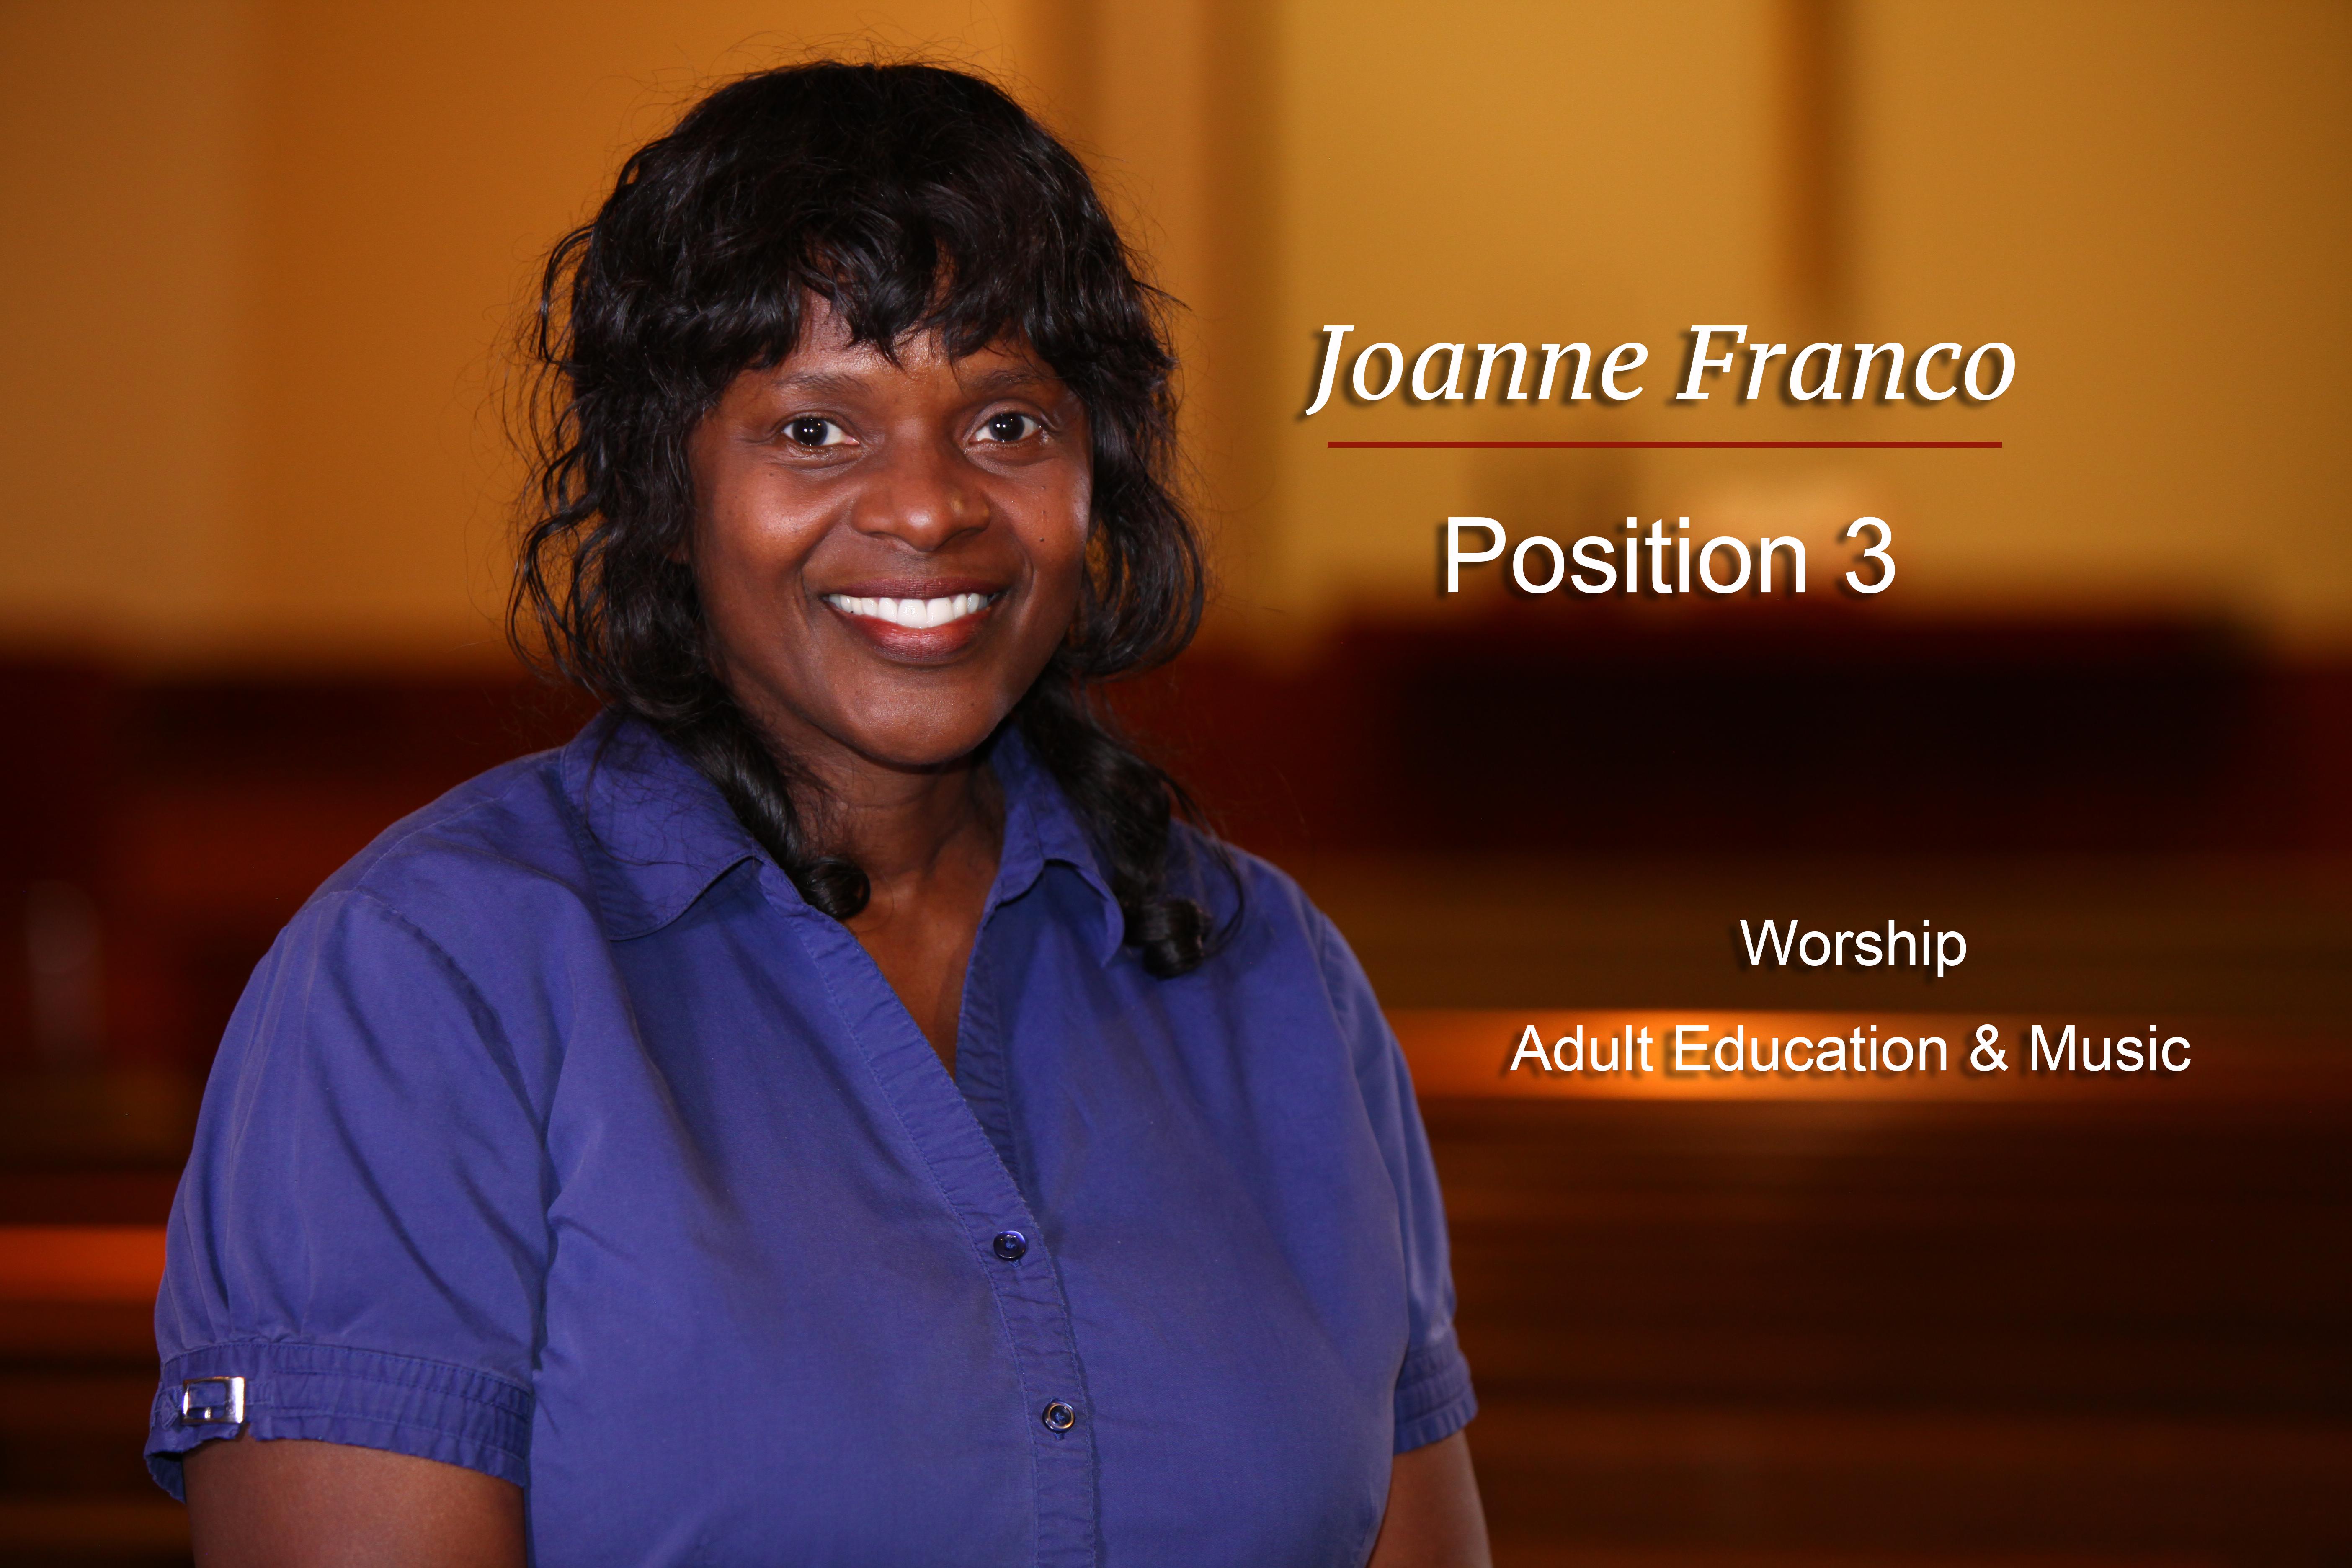 Joanne Franco